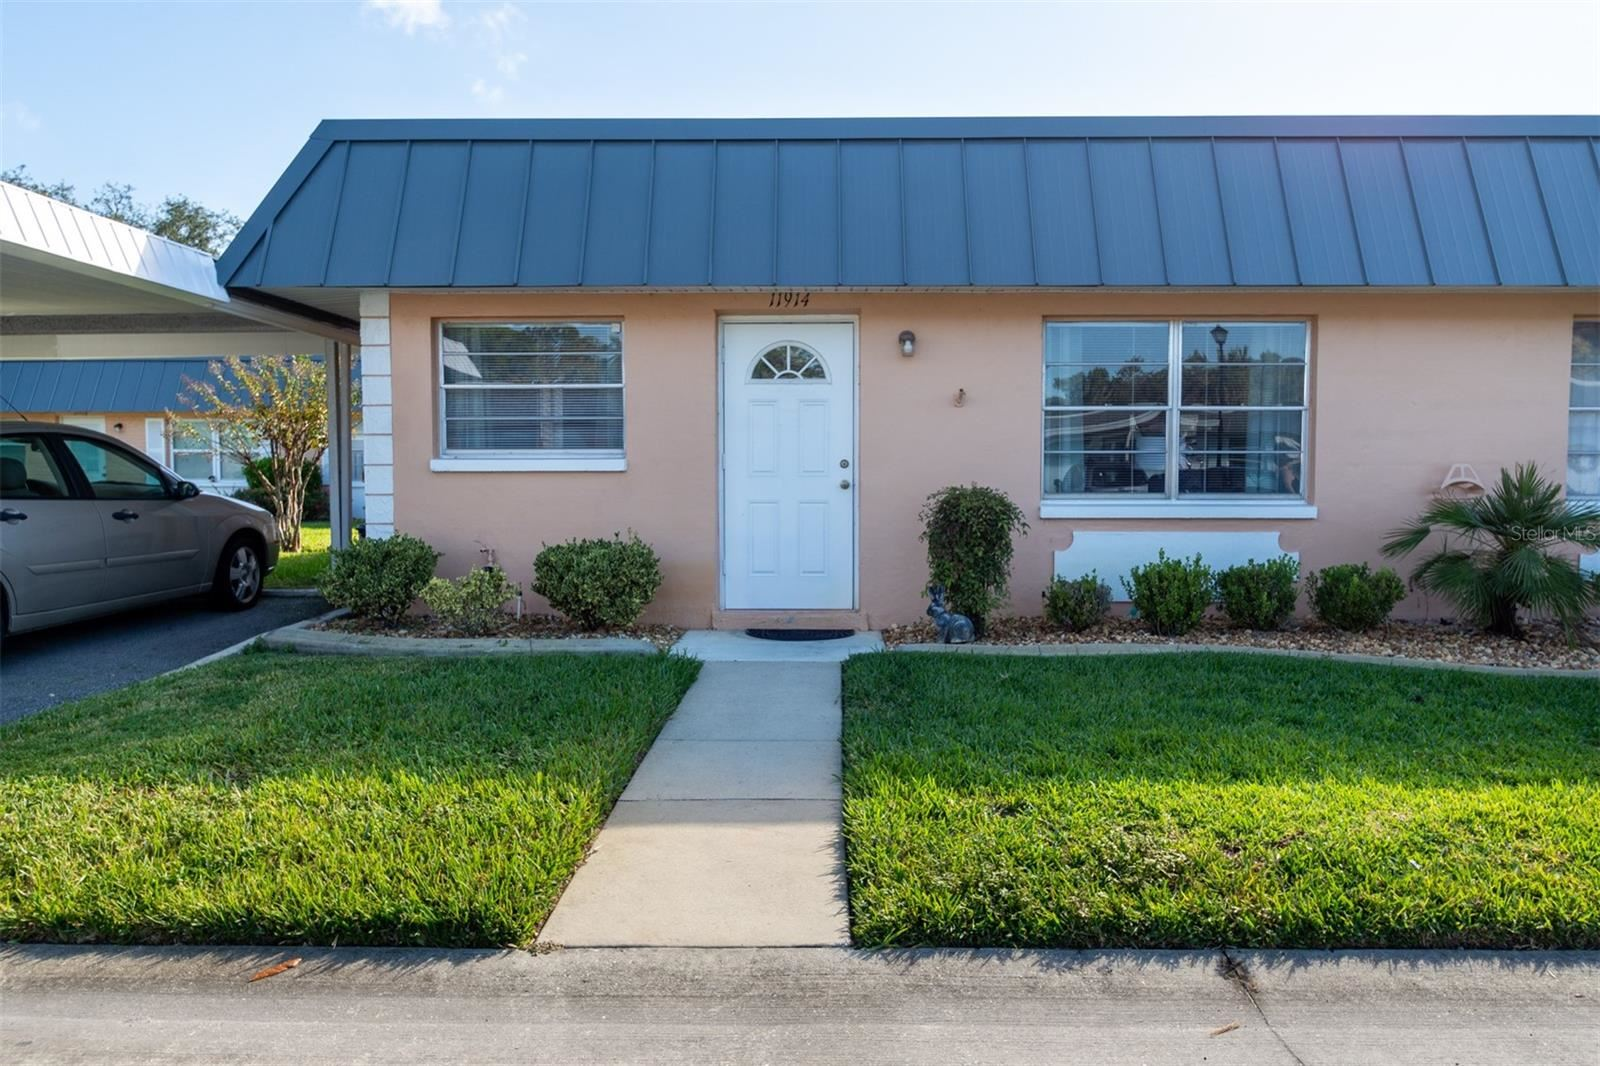 11914 BOYNTON LANE, New Port Richey, FL 34654 - #: U8139763